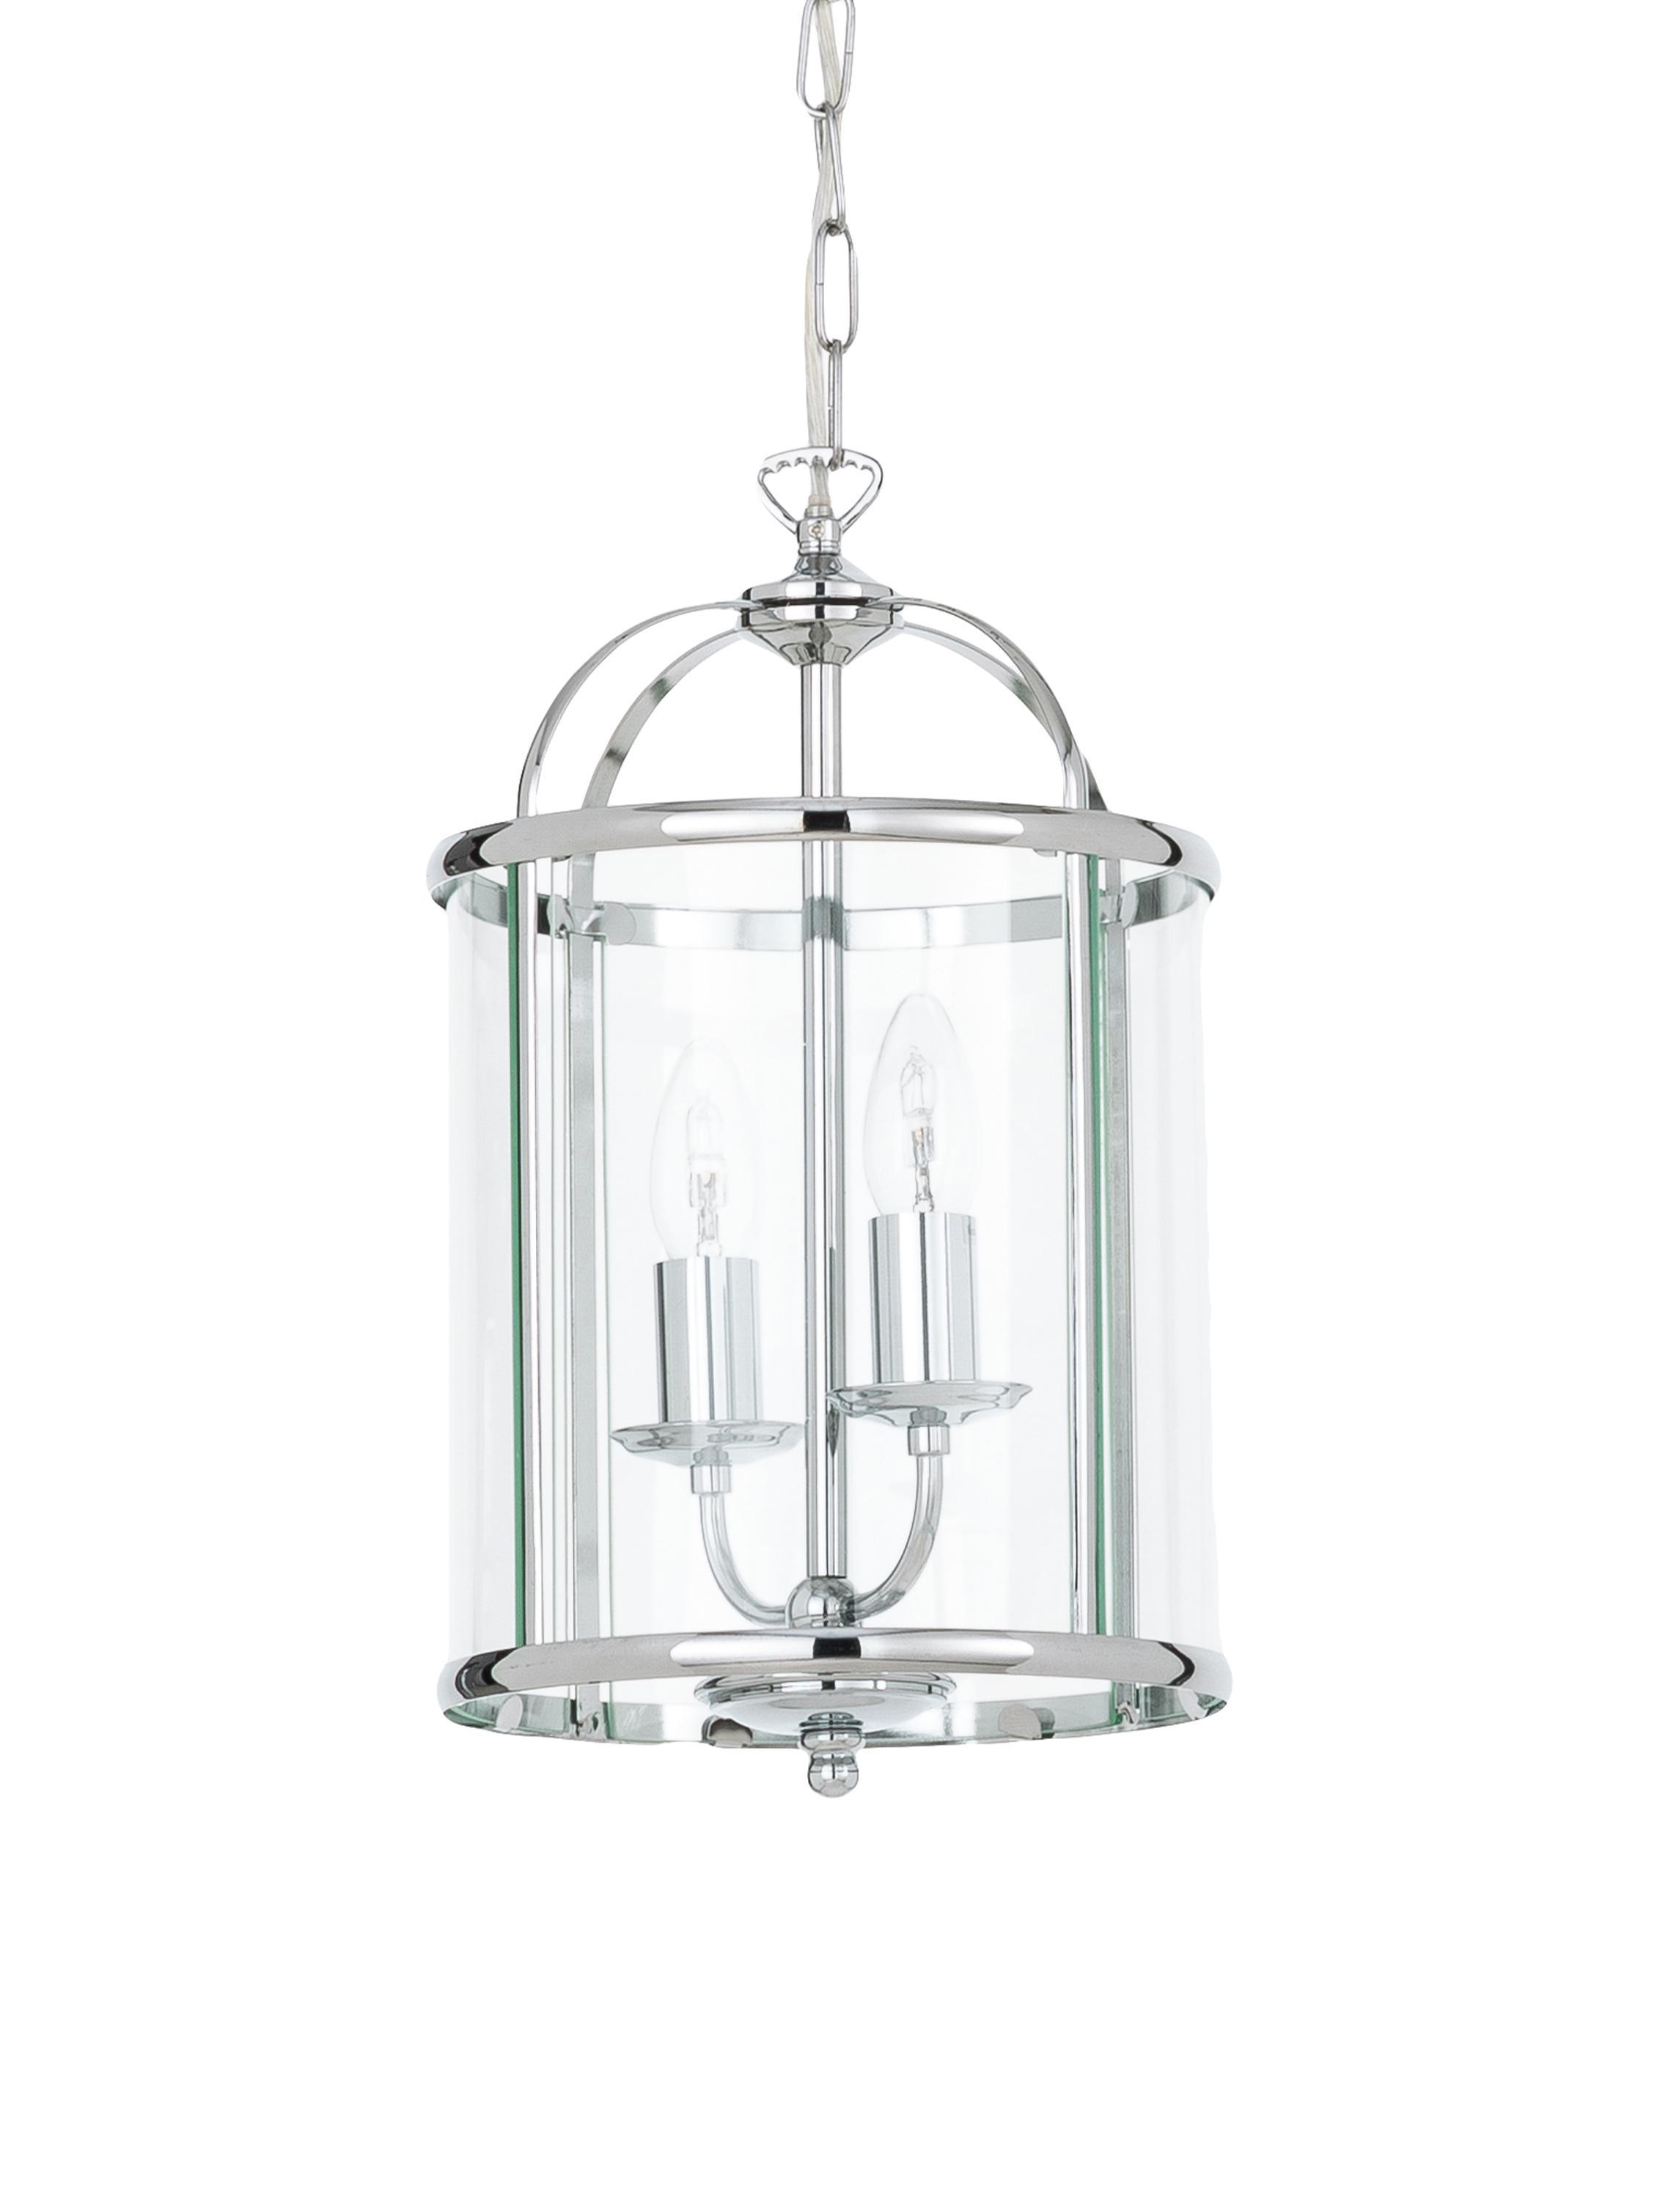 Lampada a sospensione in vetro Budgie, Paralume: nichel cromato, vetro, Baldacchino: nichel cromato, Cromo trasparente, Ø 23 x Alt. 41 cm